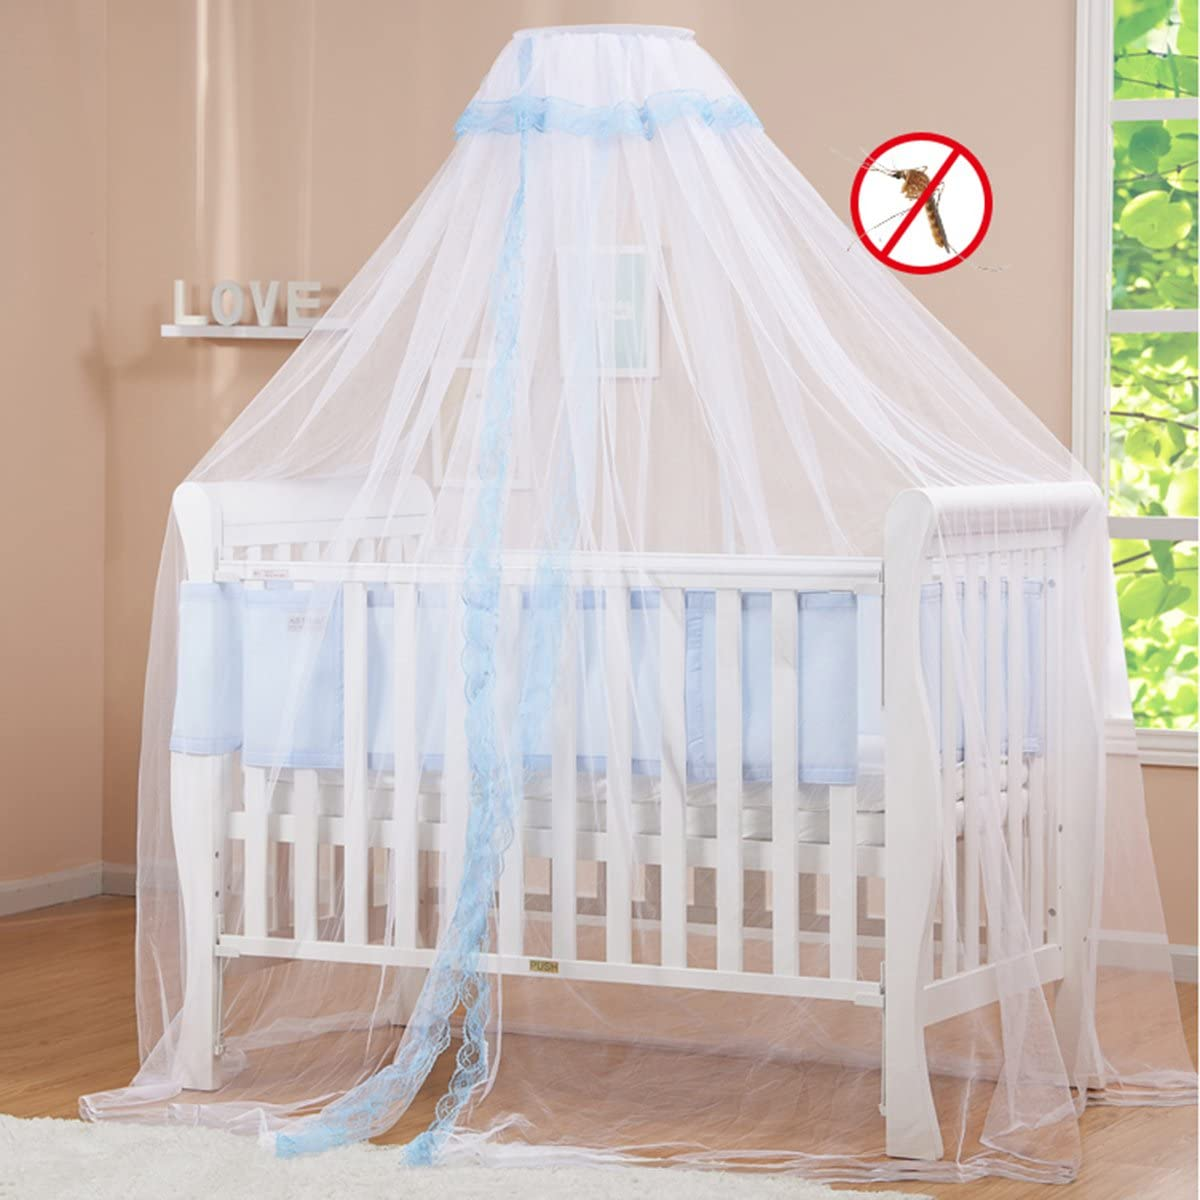 JUSTDOLIFE Child Mosquito Net Cuna Cortina Transpirable Lace Dome Bed Cortina para El Hogar